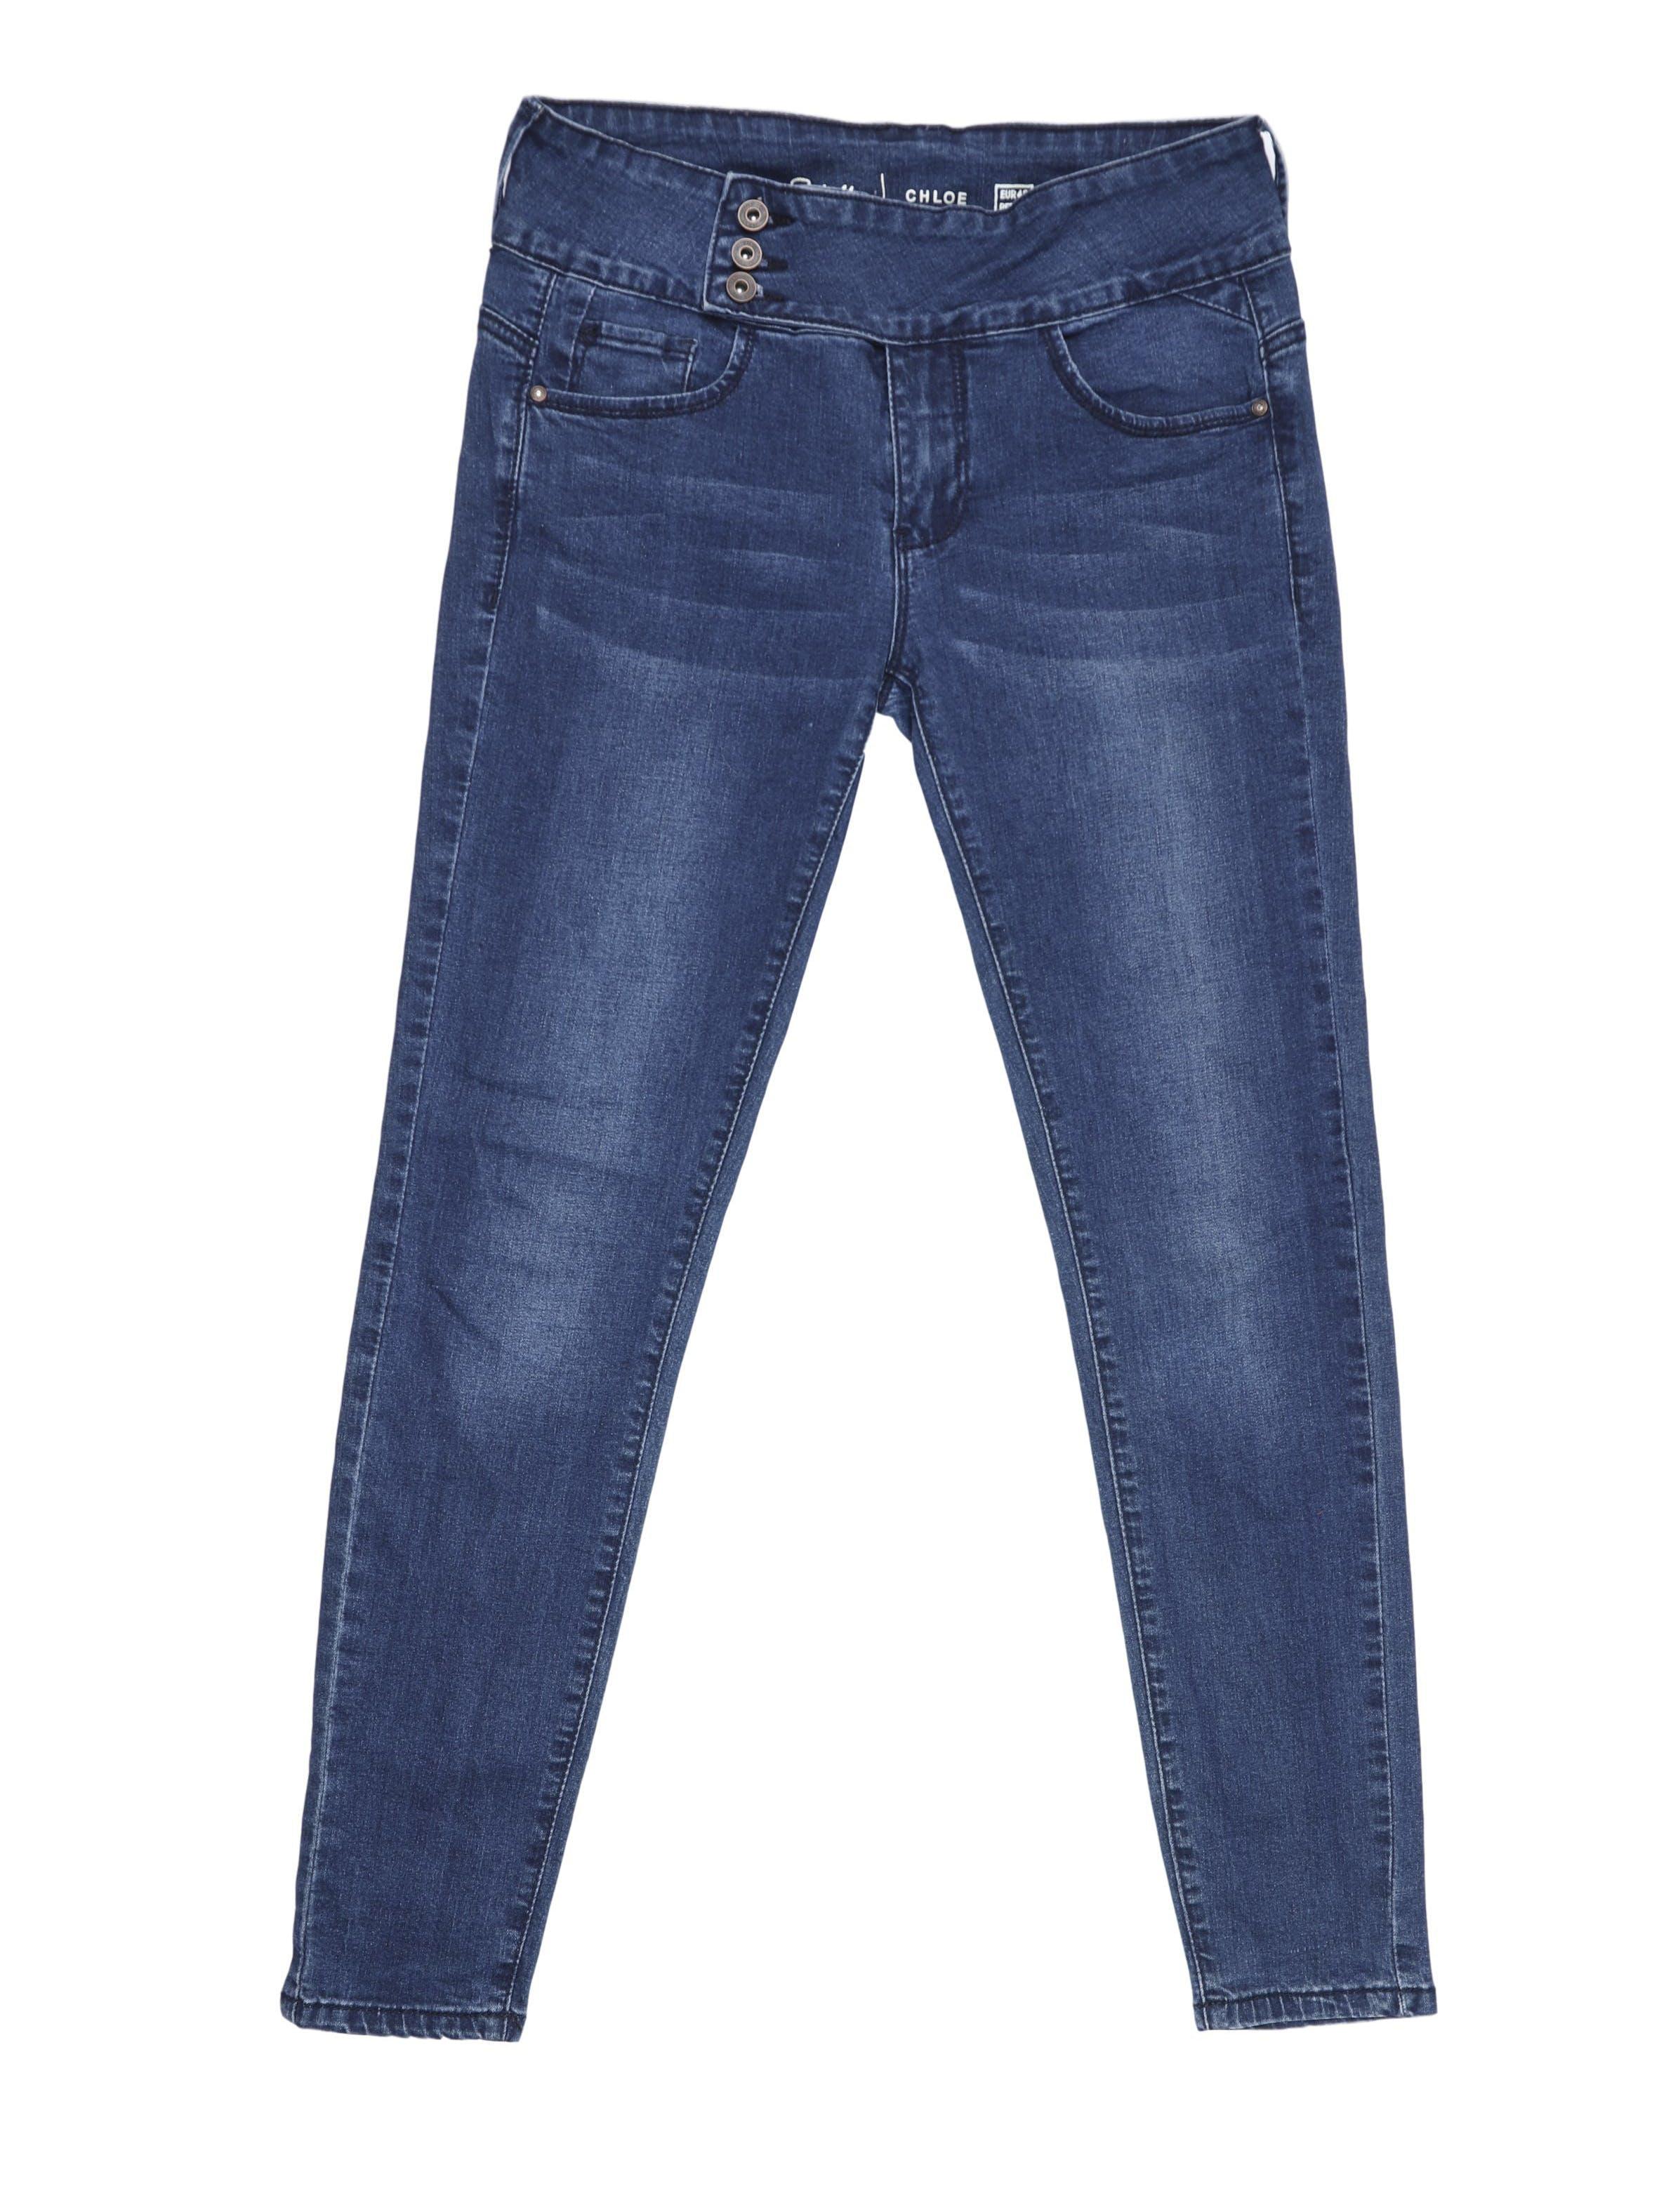 Jean pitillo Sybilla azul con ligero focalizado, 75% algodón ligeramente stretch. Pretina 78cm